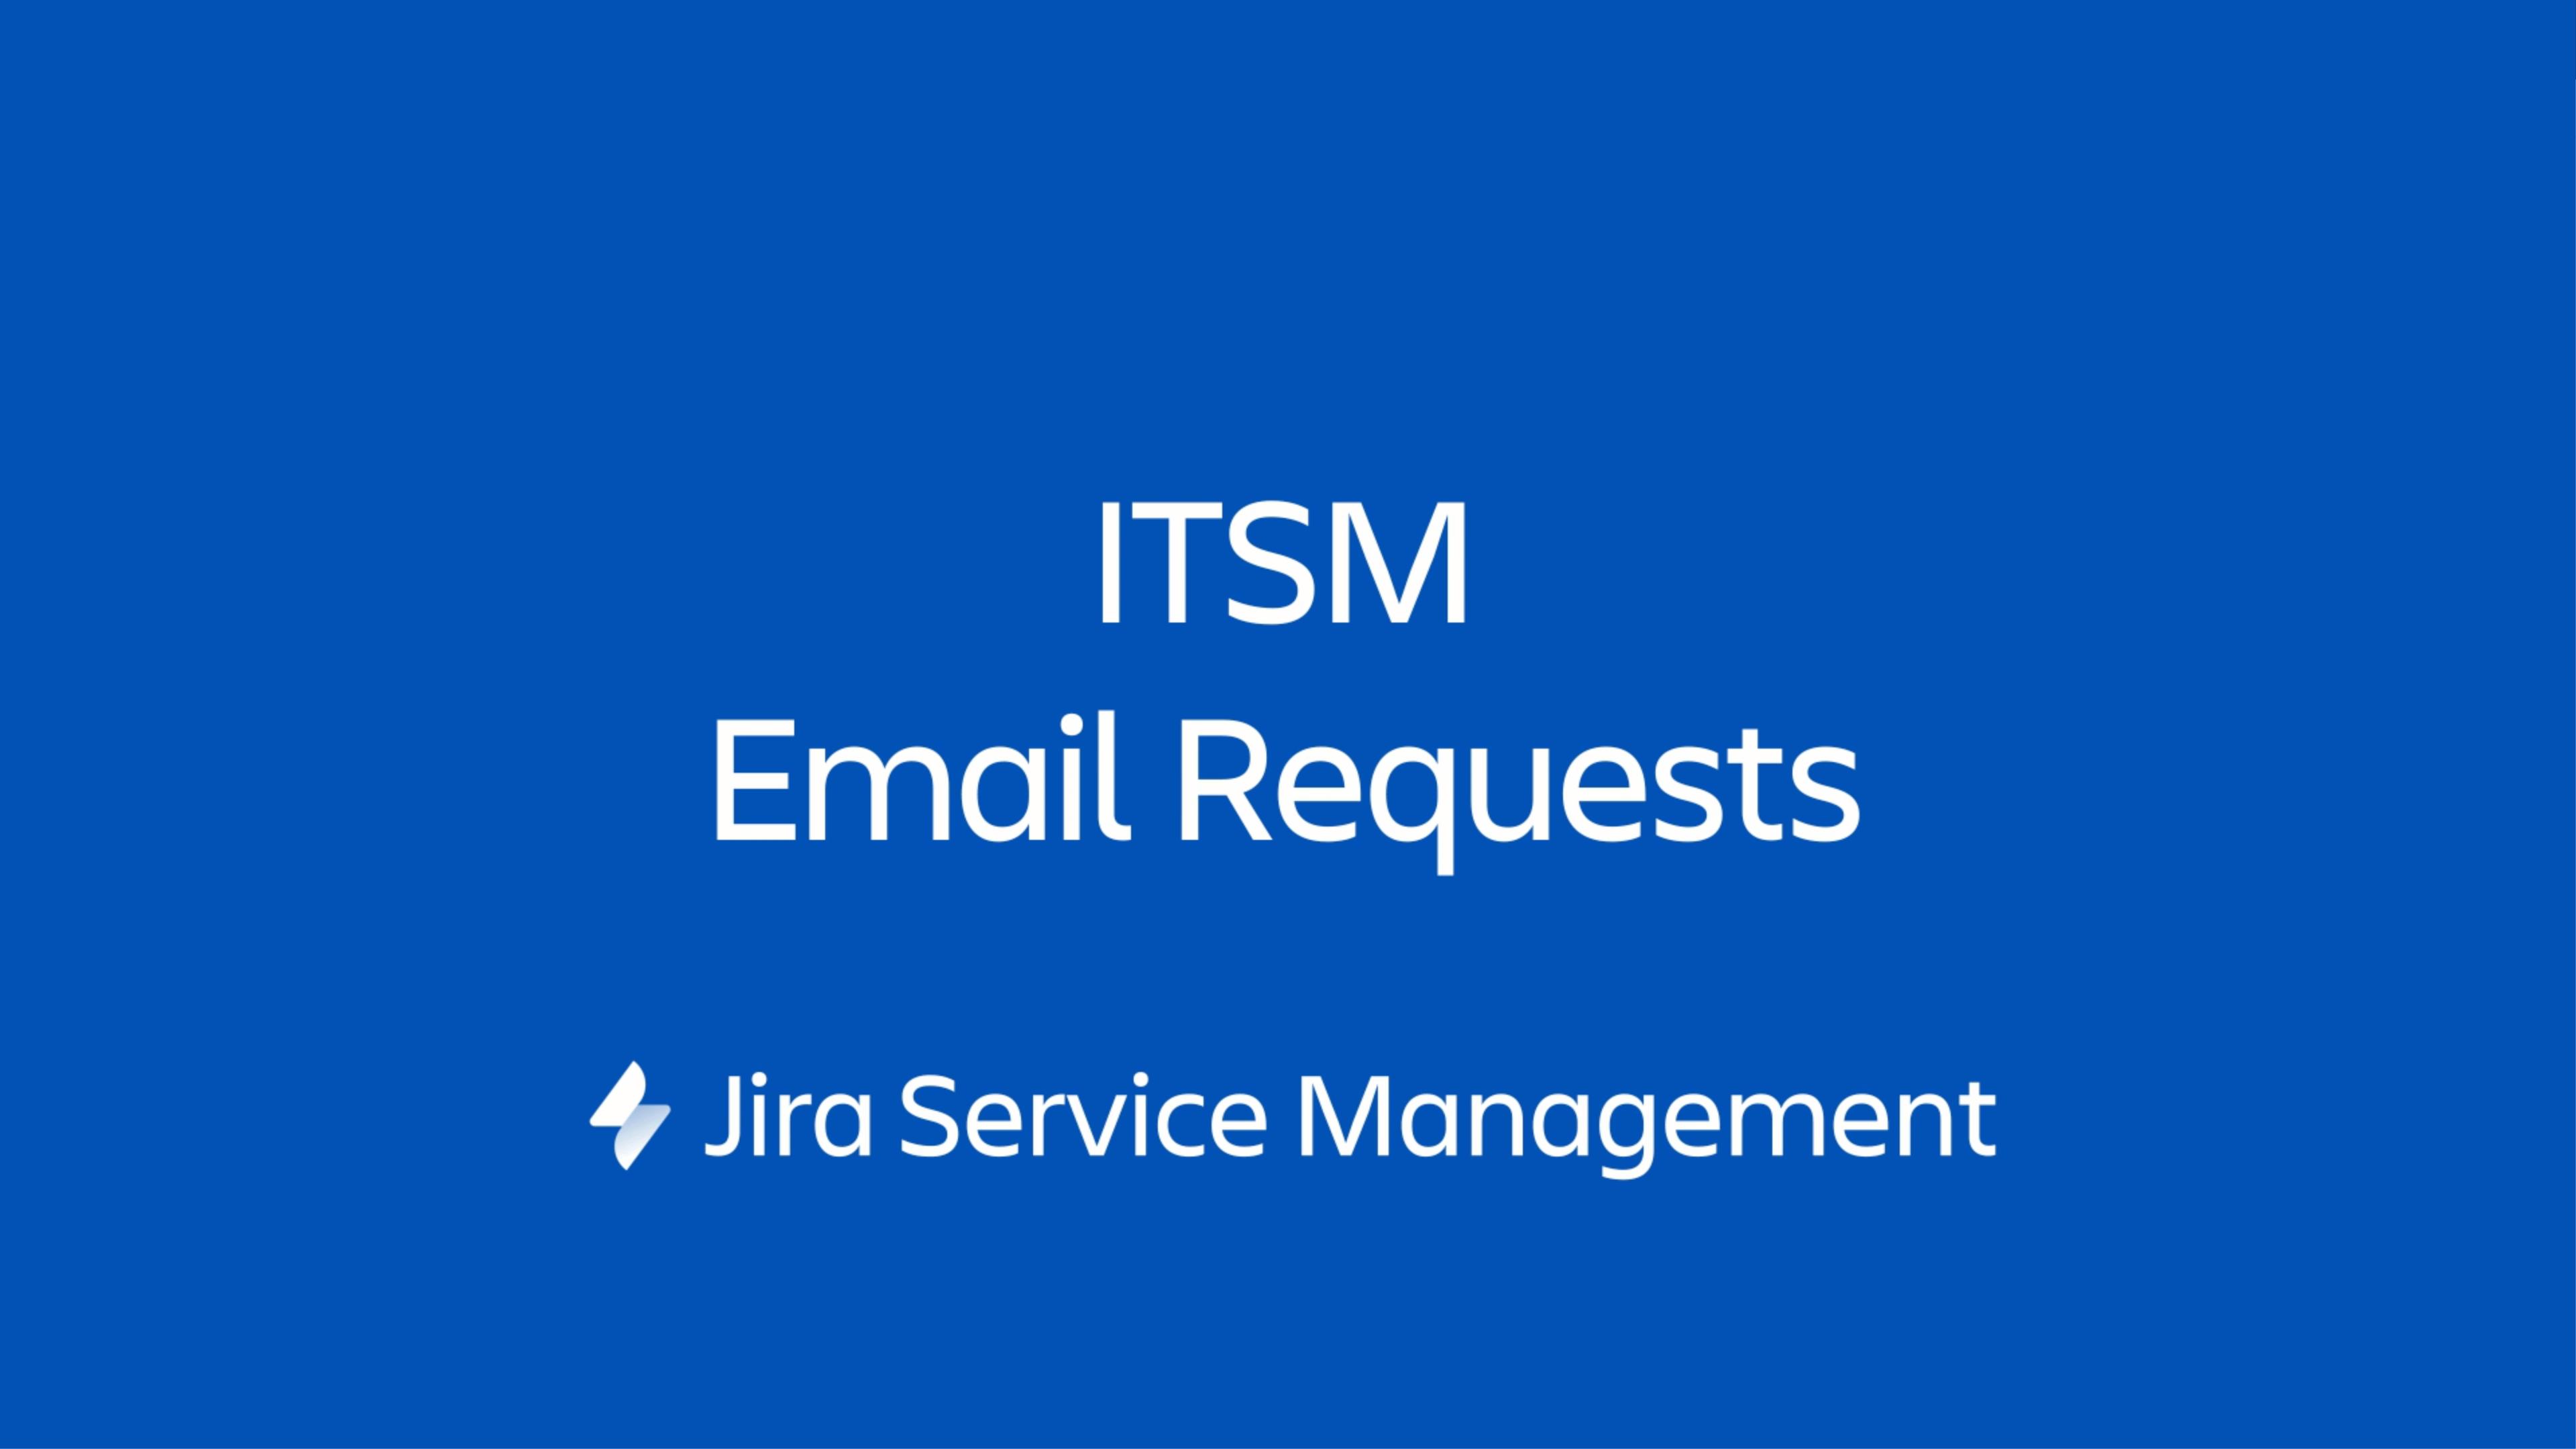 ITSM-E-Mail-Anfragen in Jira Service Management